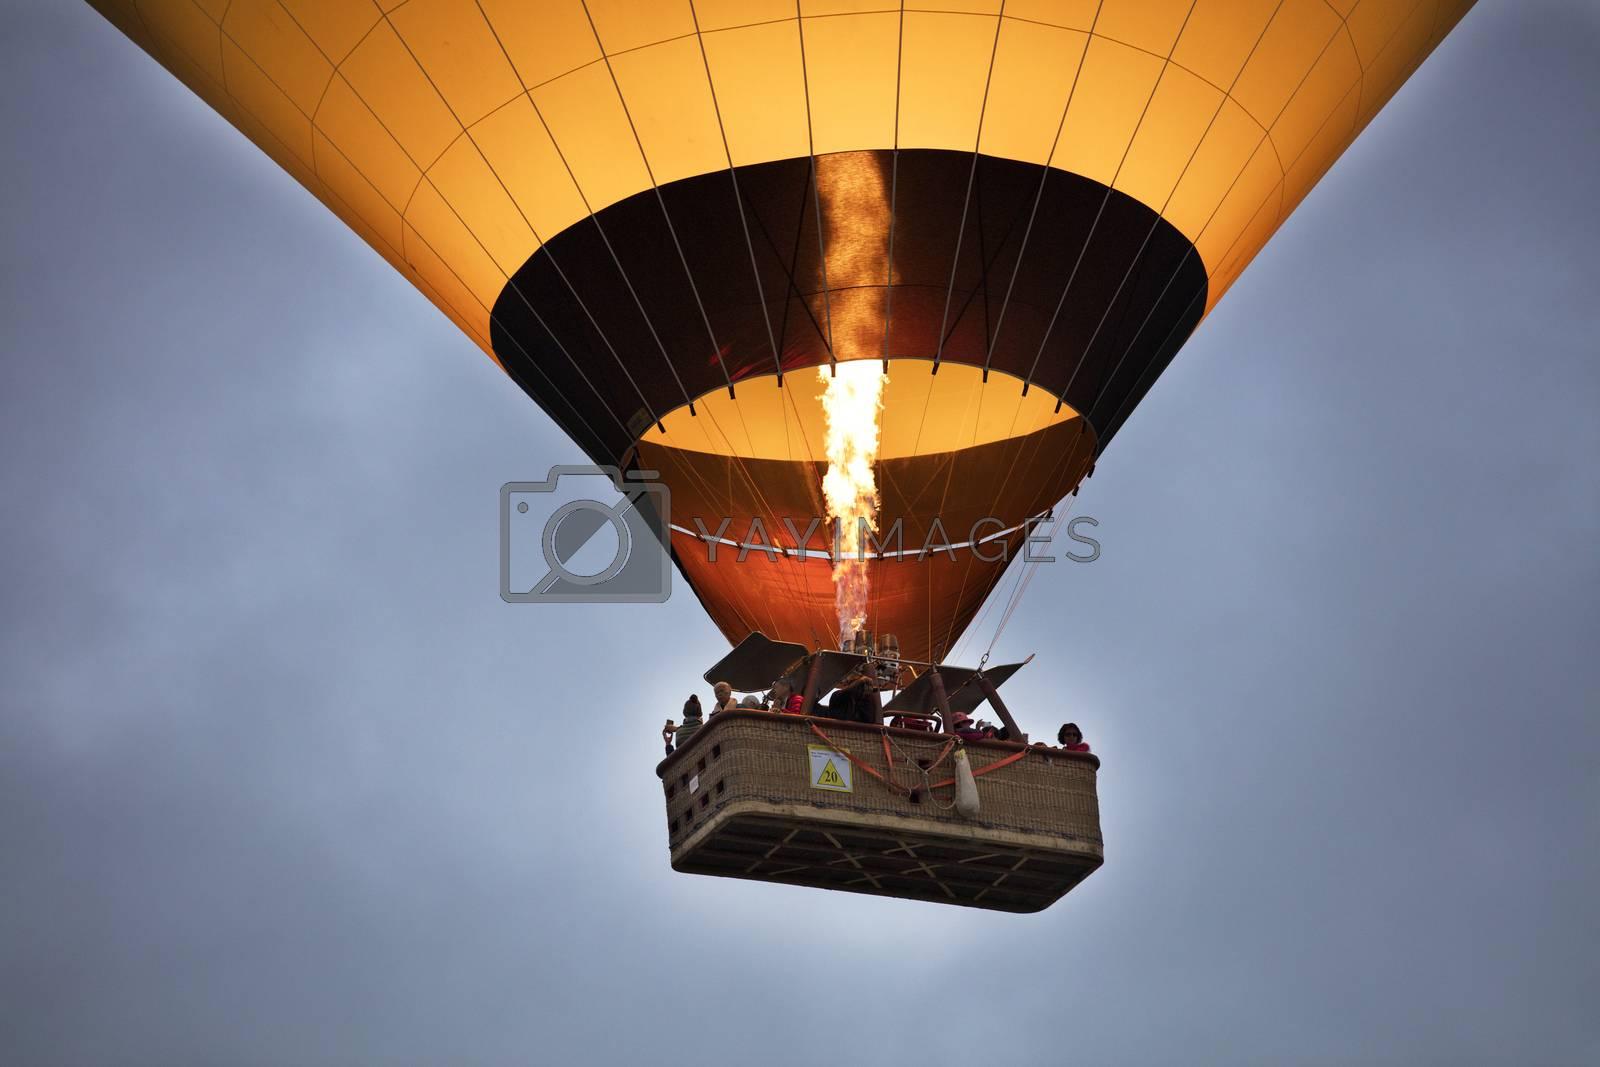 Flight of a balloon in the blue sky, view of the basket overhead. Cappadocia. 12.05.2018. Turkey.